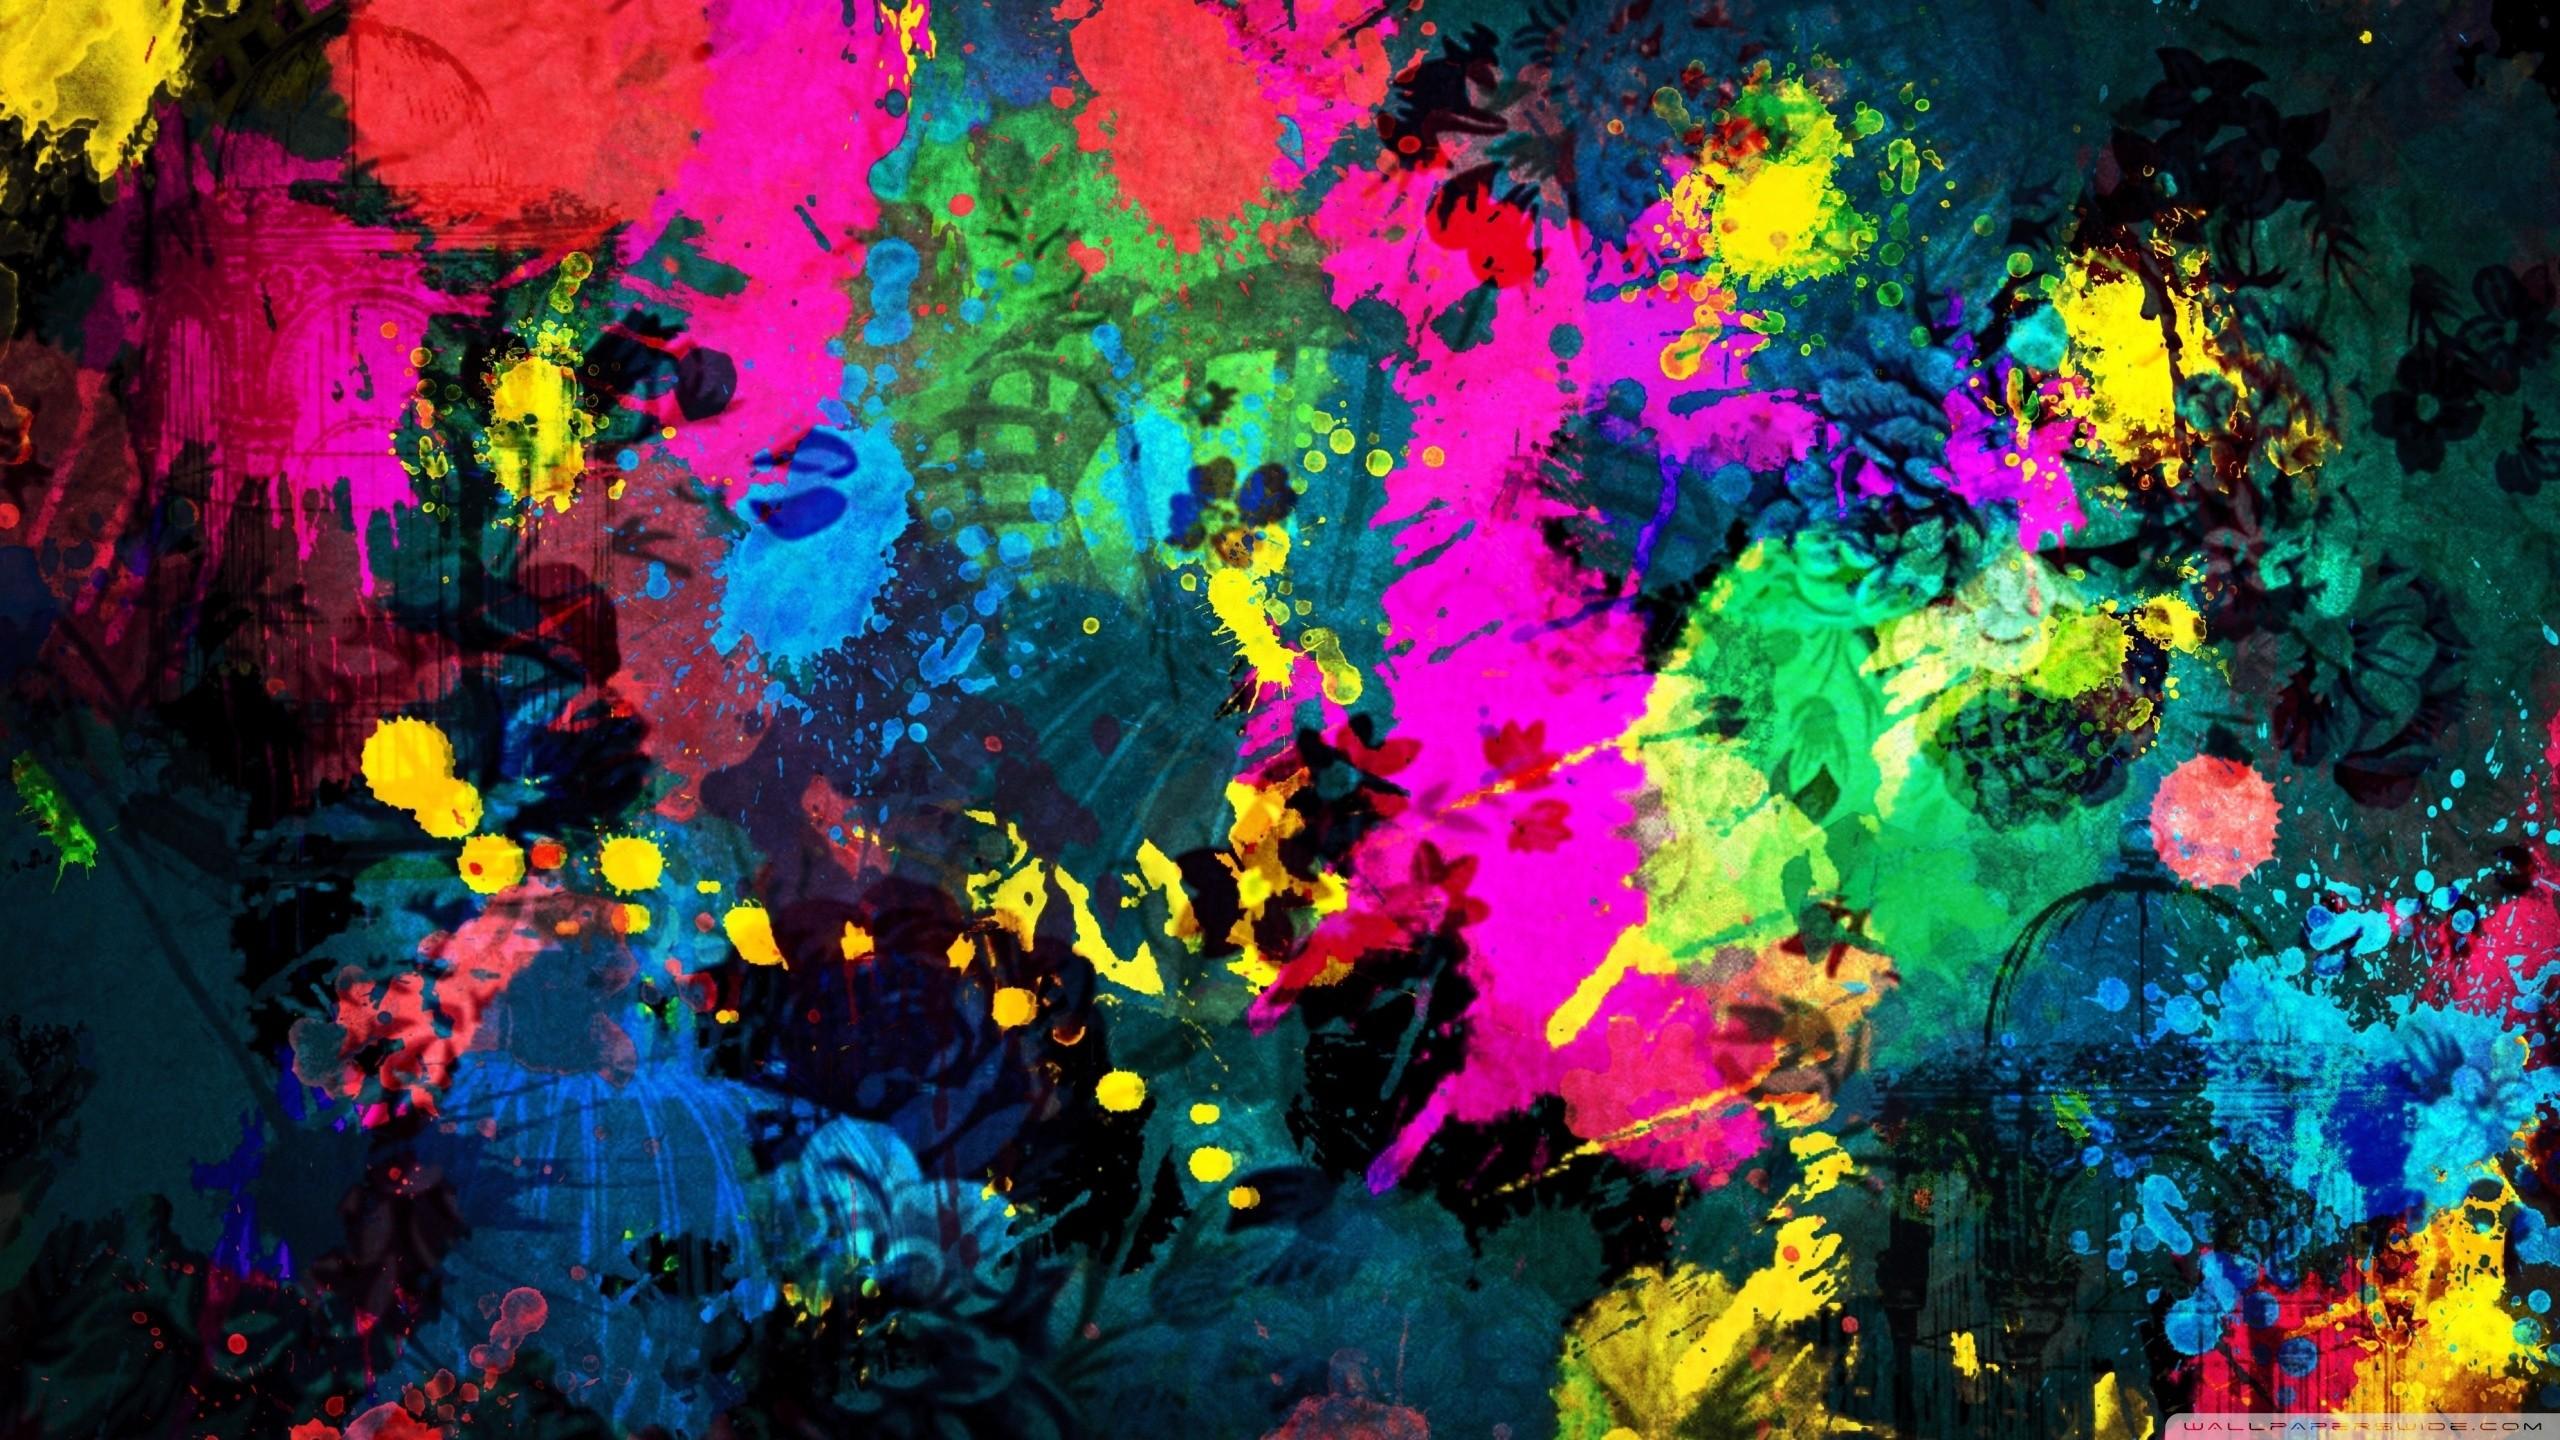 paint splatter wallpaper background 2560x1440